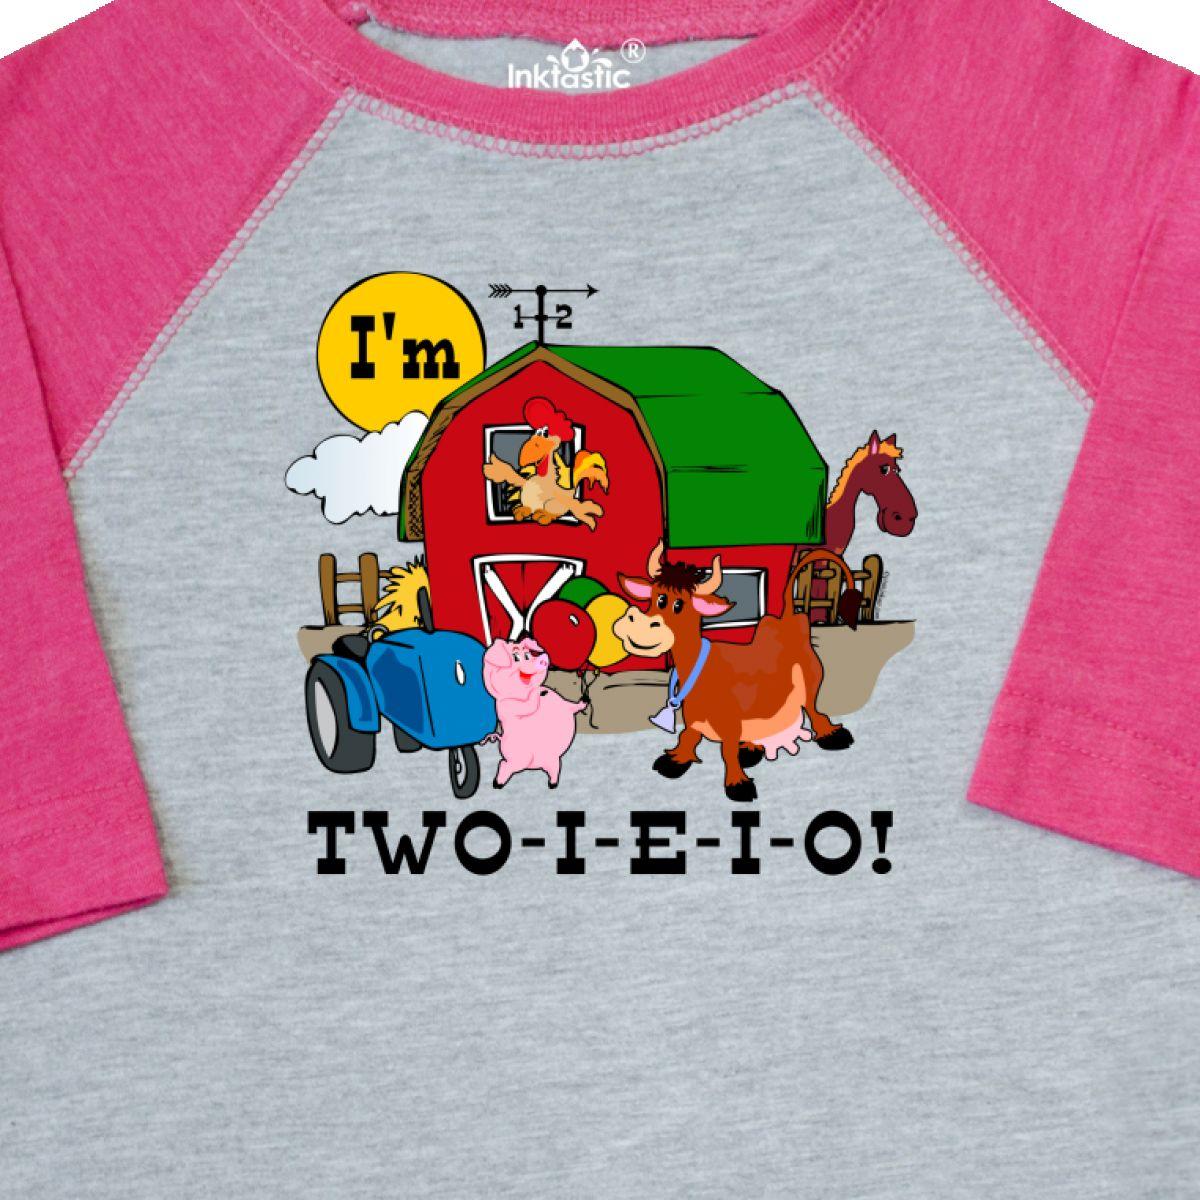 Details About Inktastic TWO I E I O Toddler T Shirt 2nd Birthday Farm Barn Cow Pig Horse Eieio